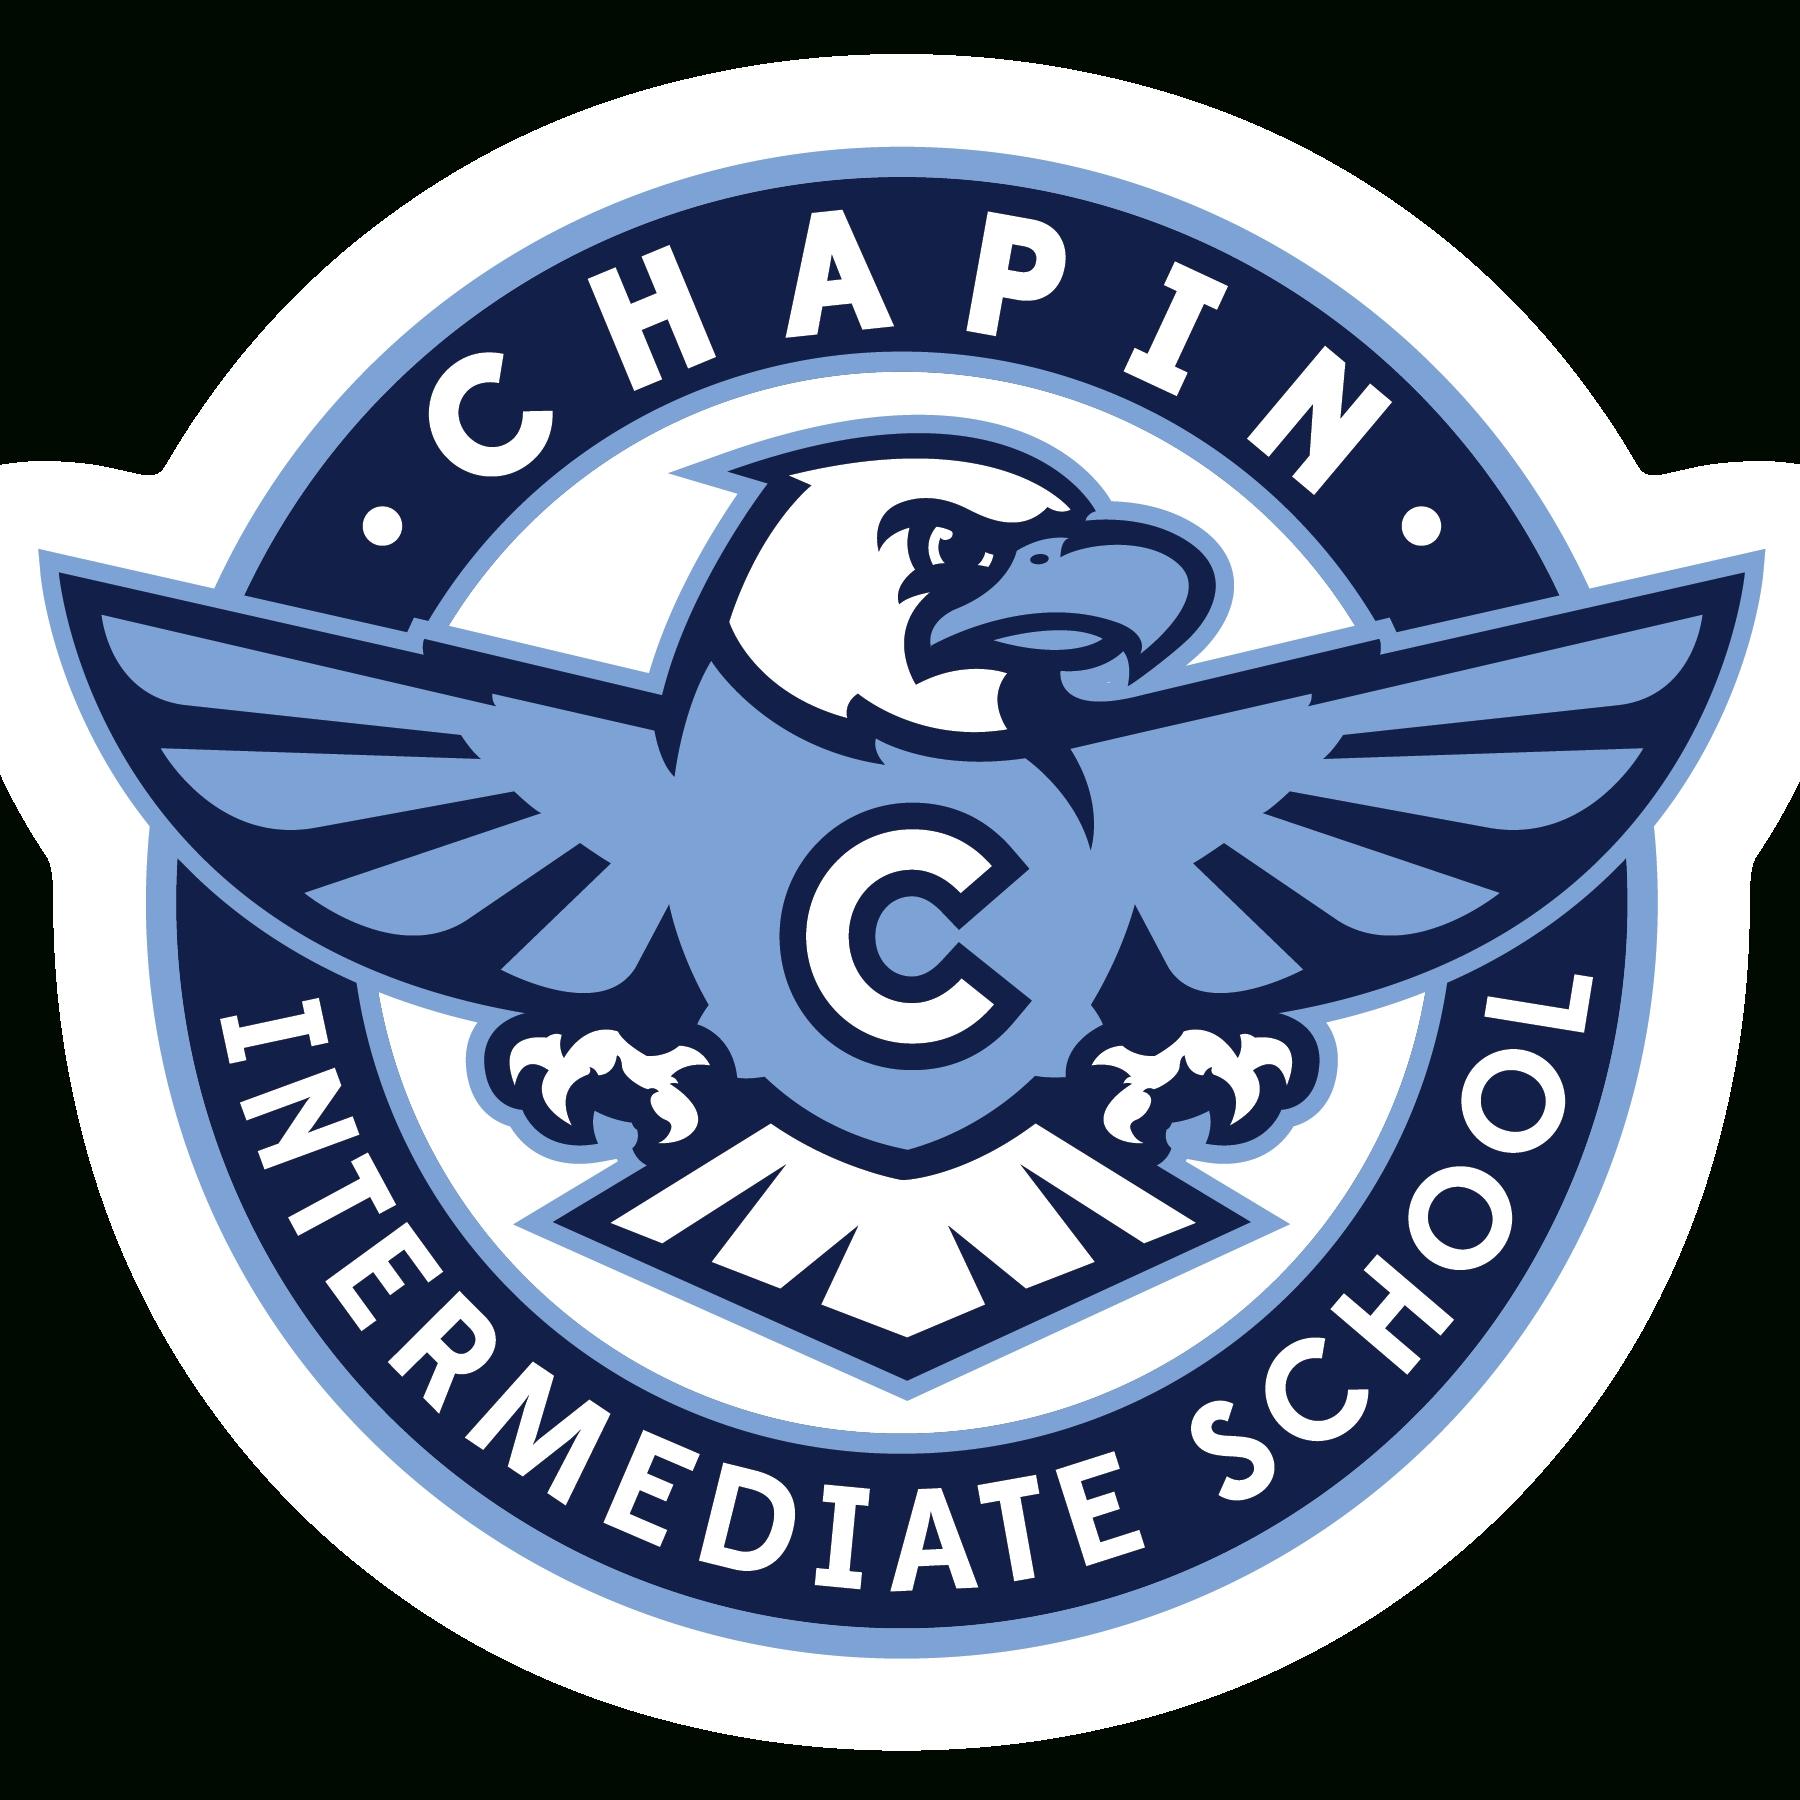 Chapin Intermediate School / Calendar Lex Rich 5 Calendar 2019